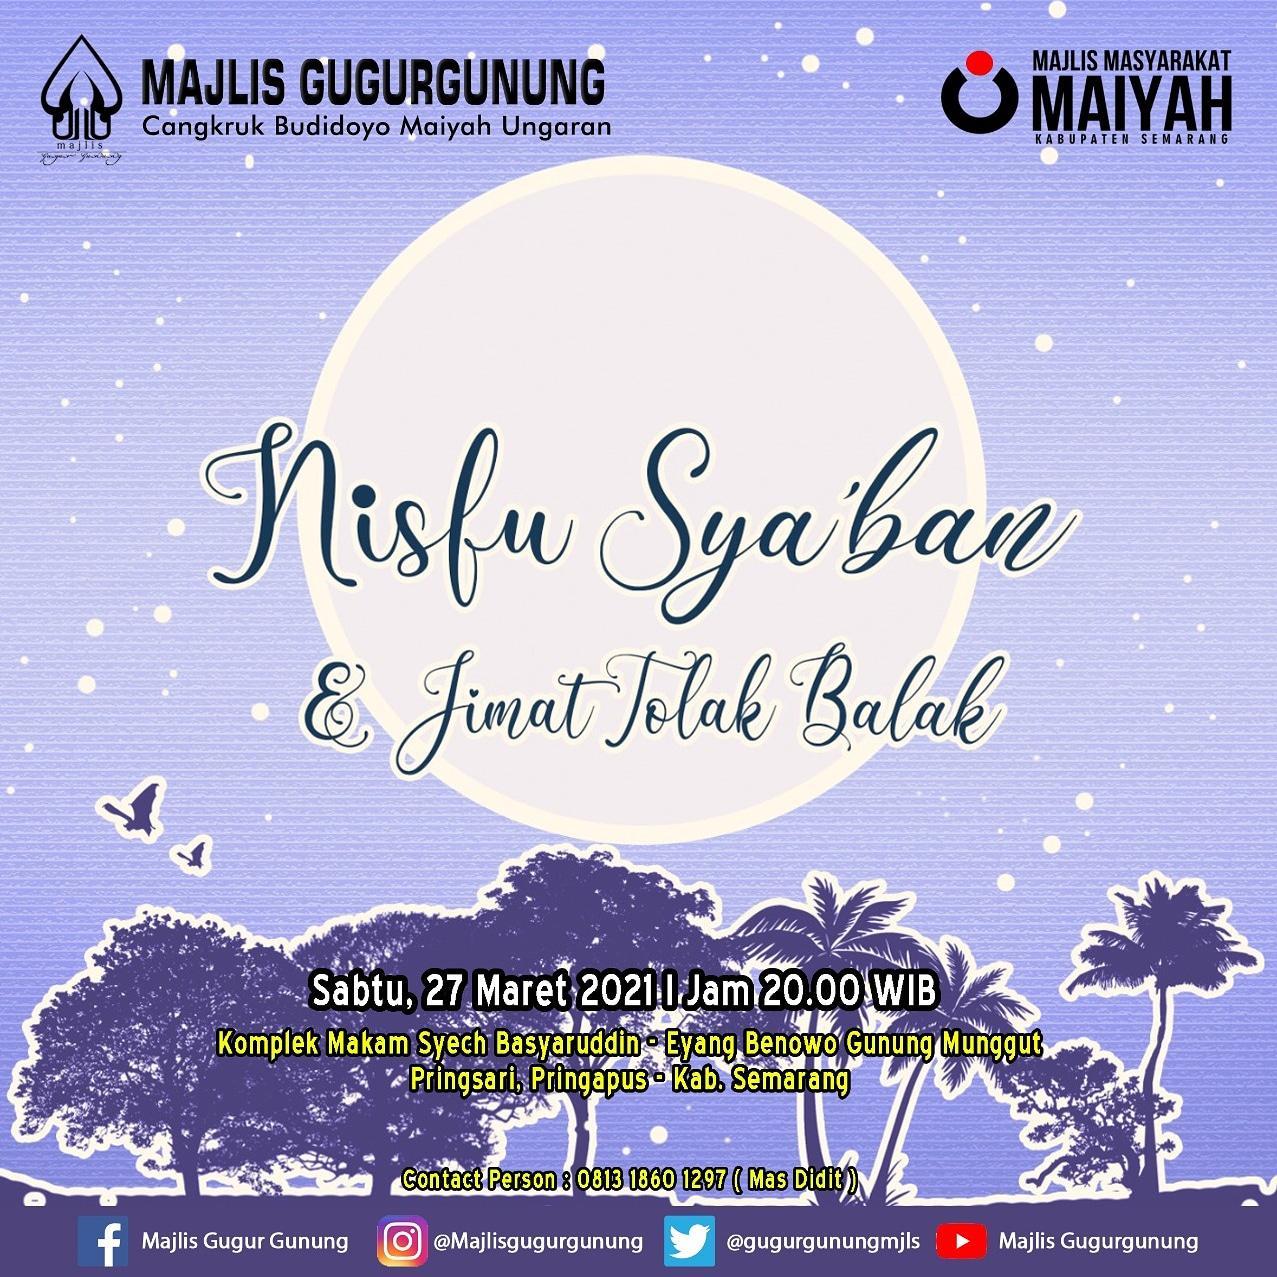 Nisfu Sya'ban & Jimat Tolak Balak